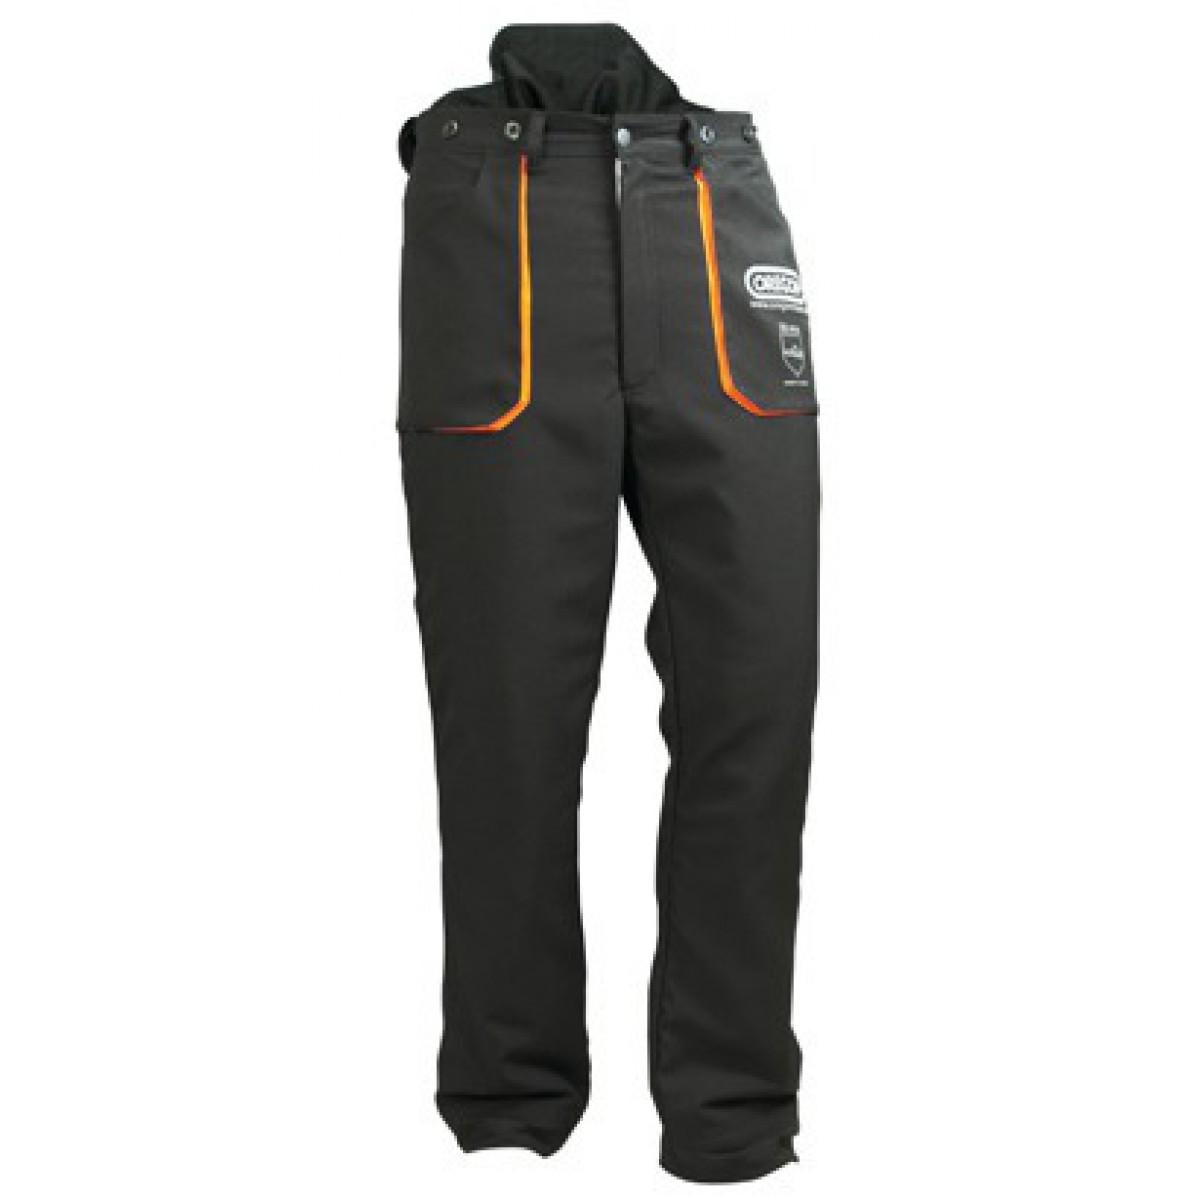 Pantalon de protection Yukon® Oregon - Taille M